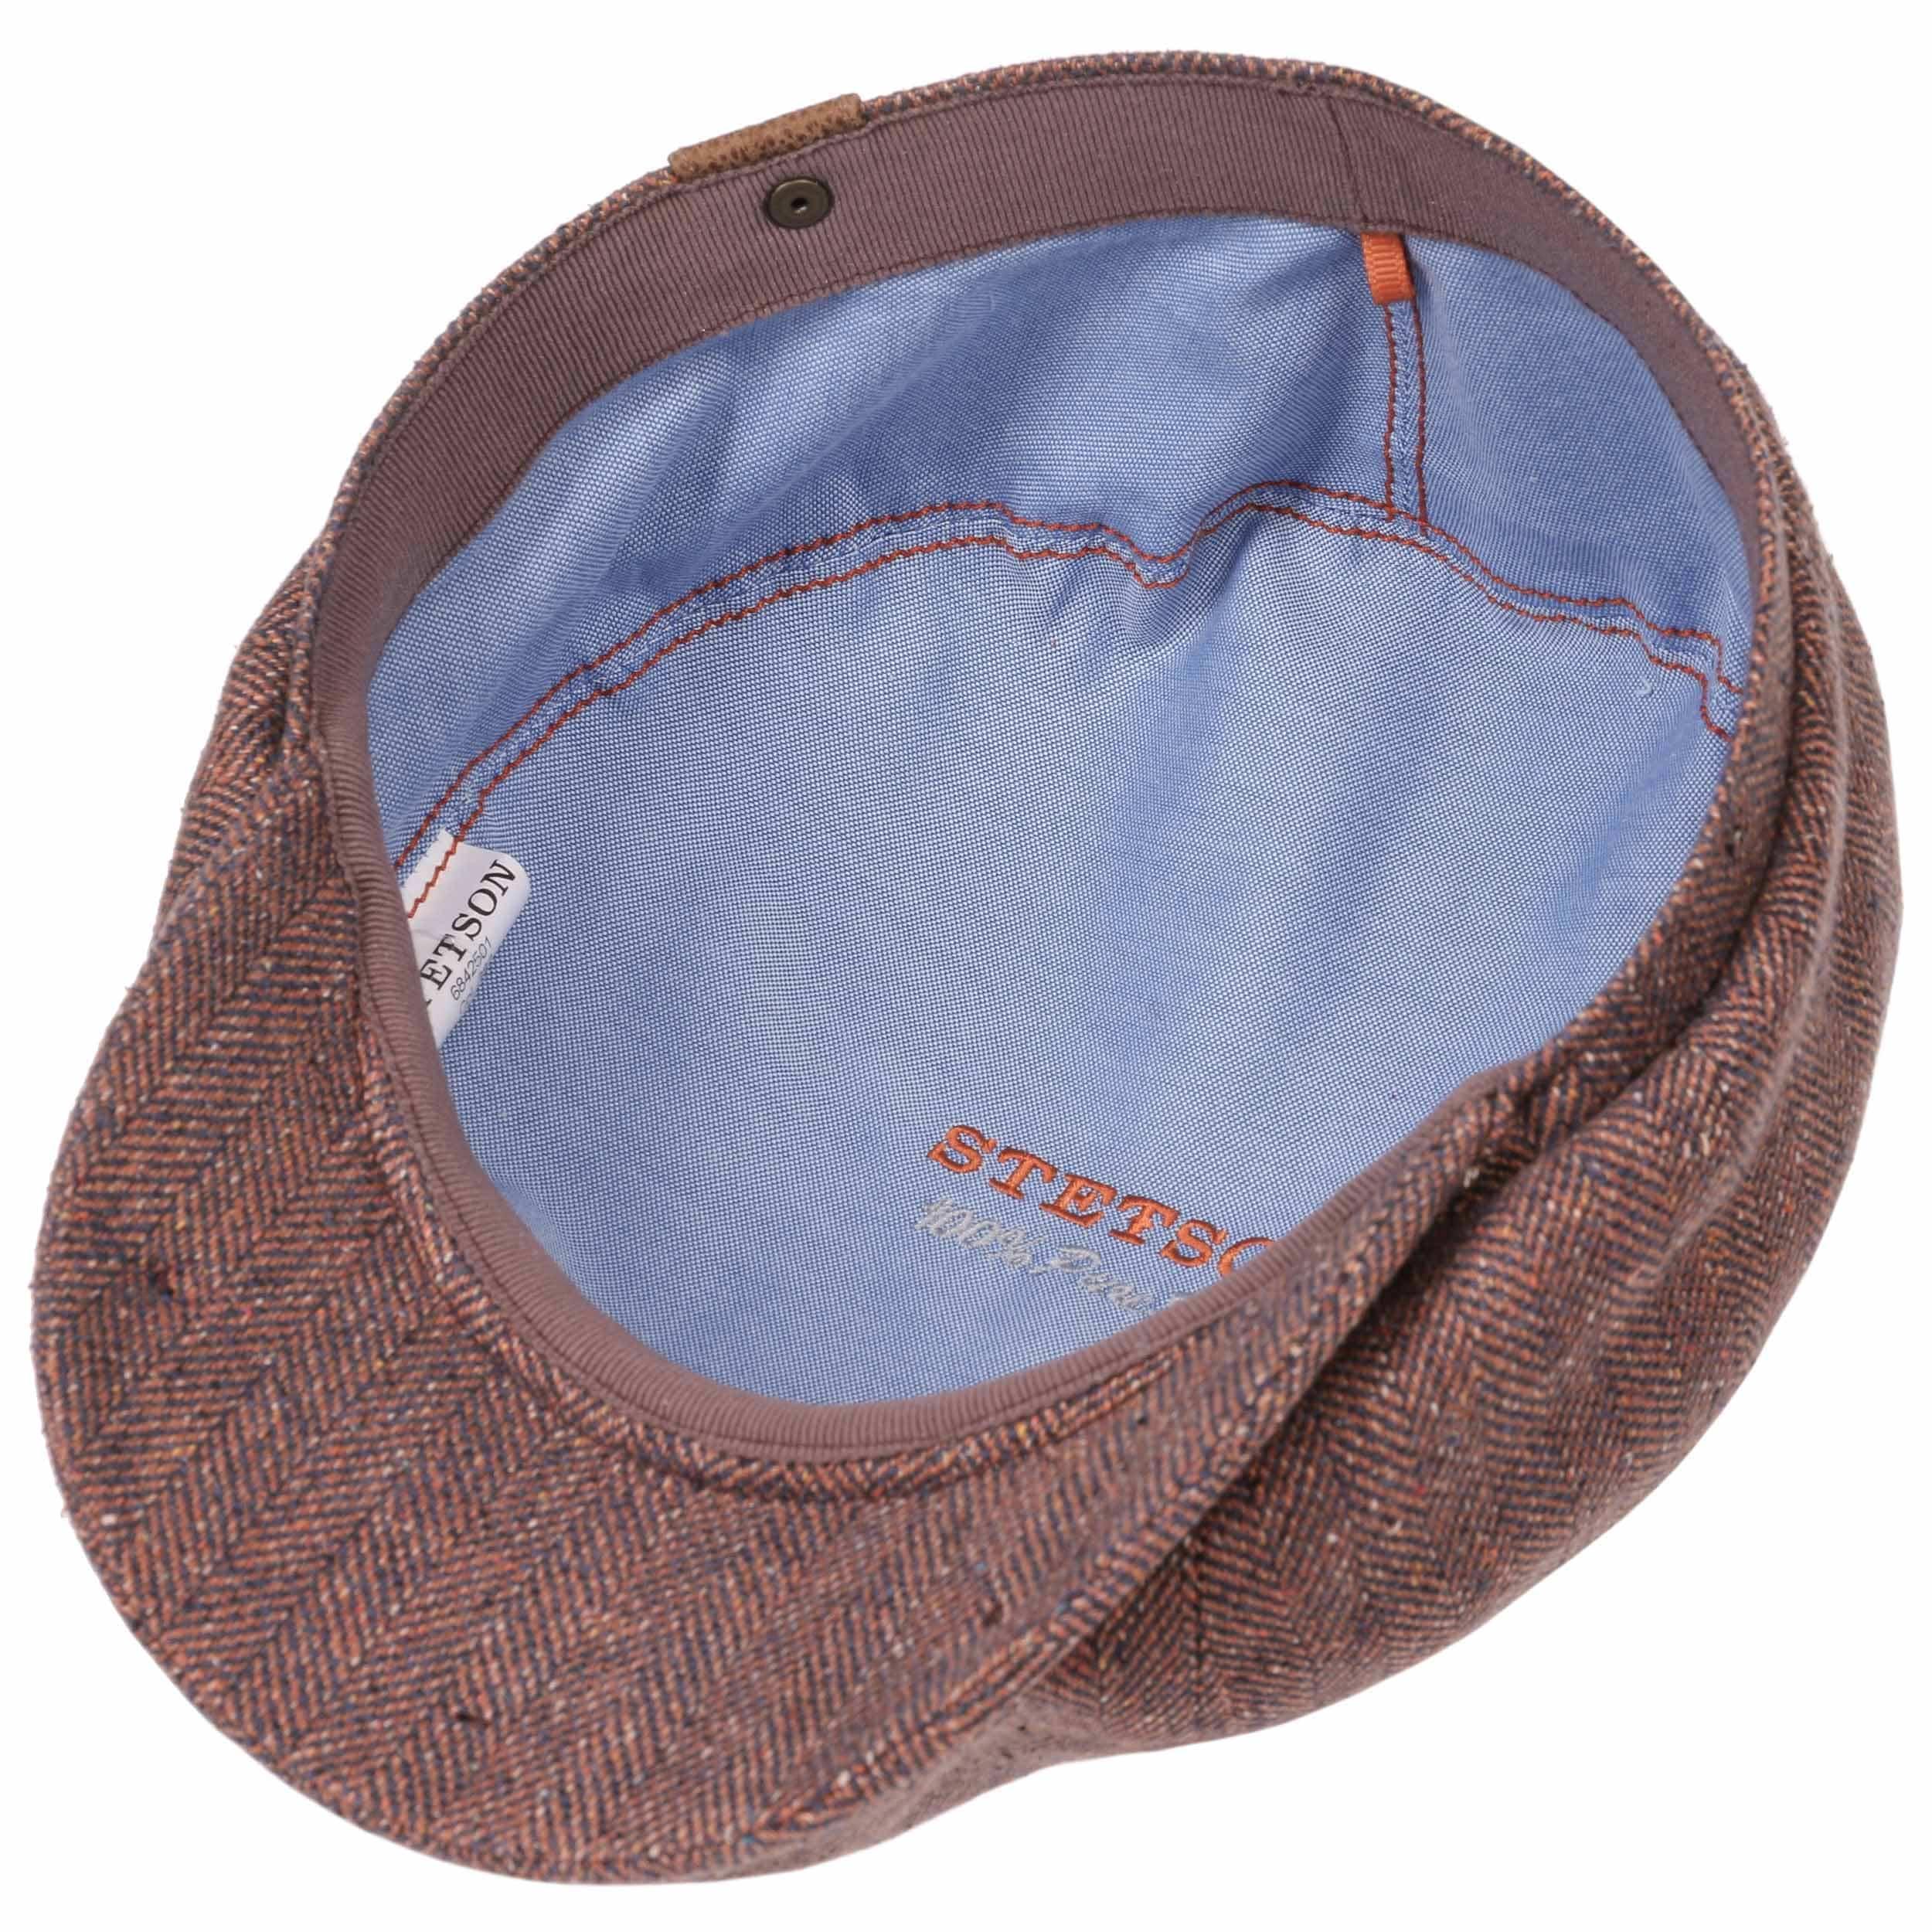 7f9f7f44e8294 ... Hatteras Silk Flat Cap by Stetson - rust-blue 2 ...